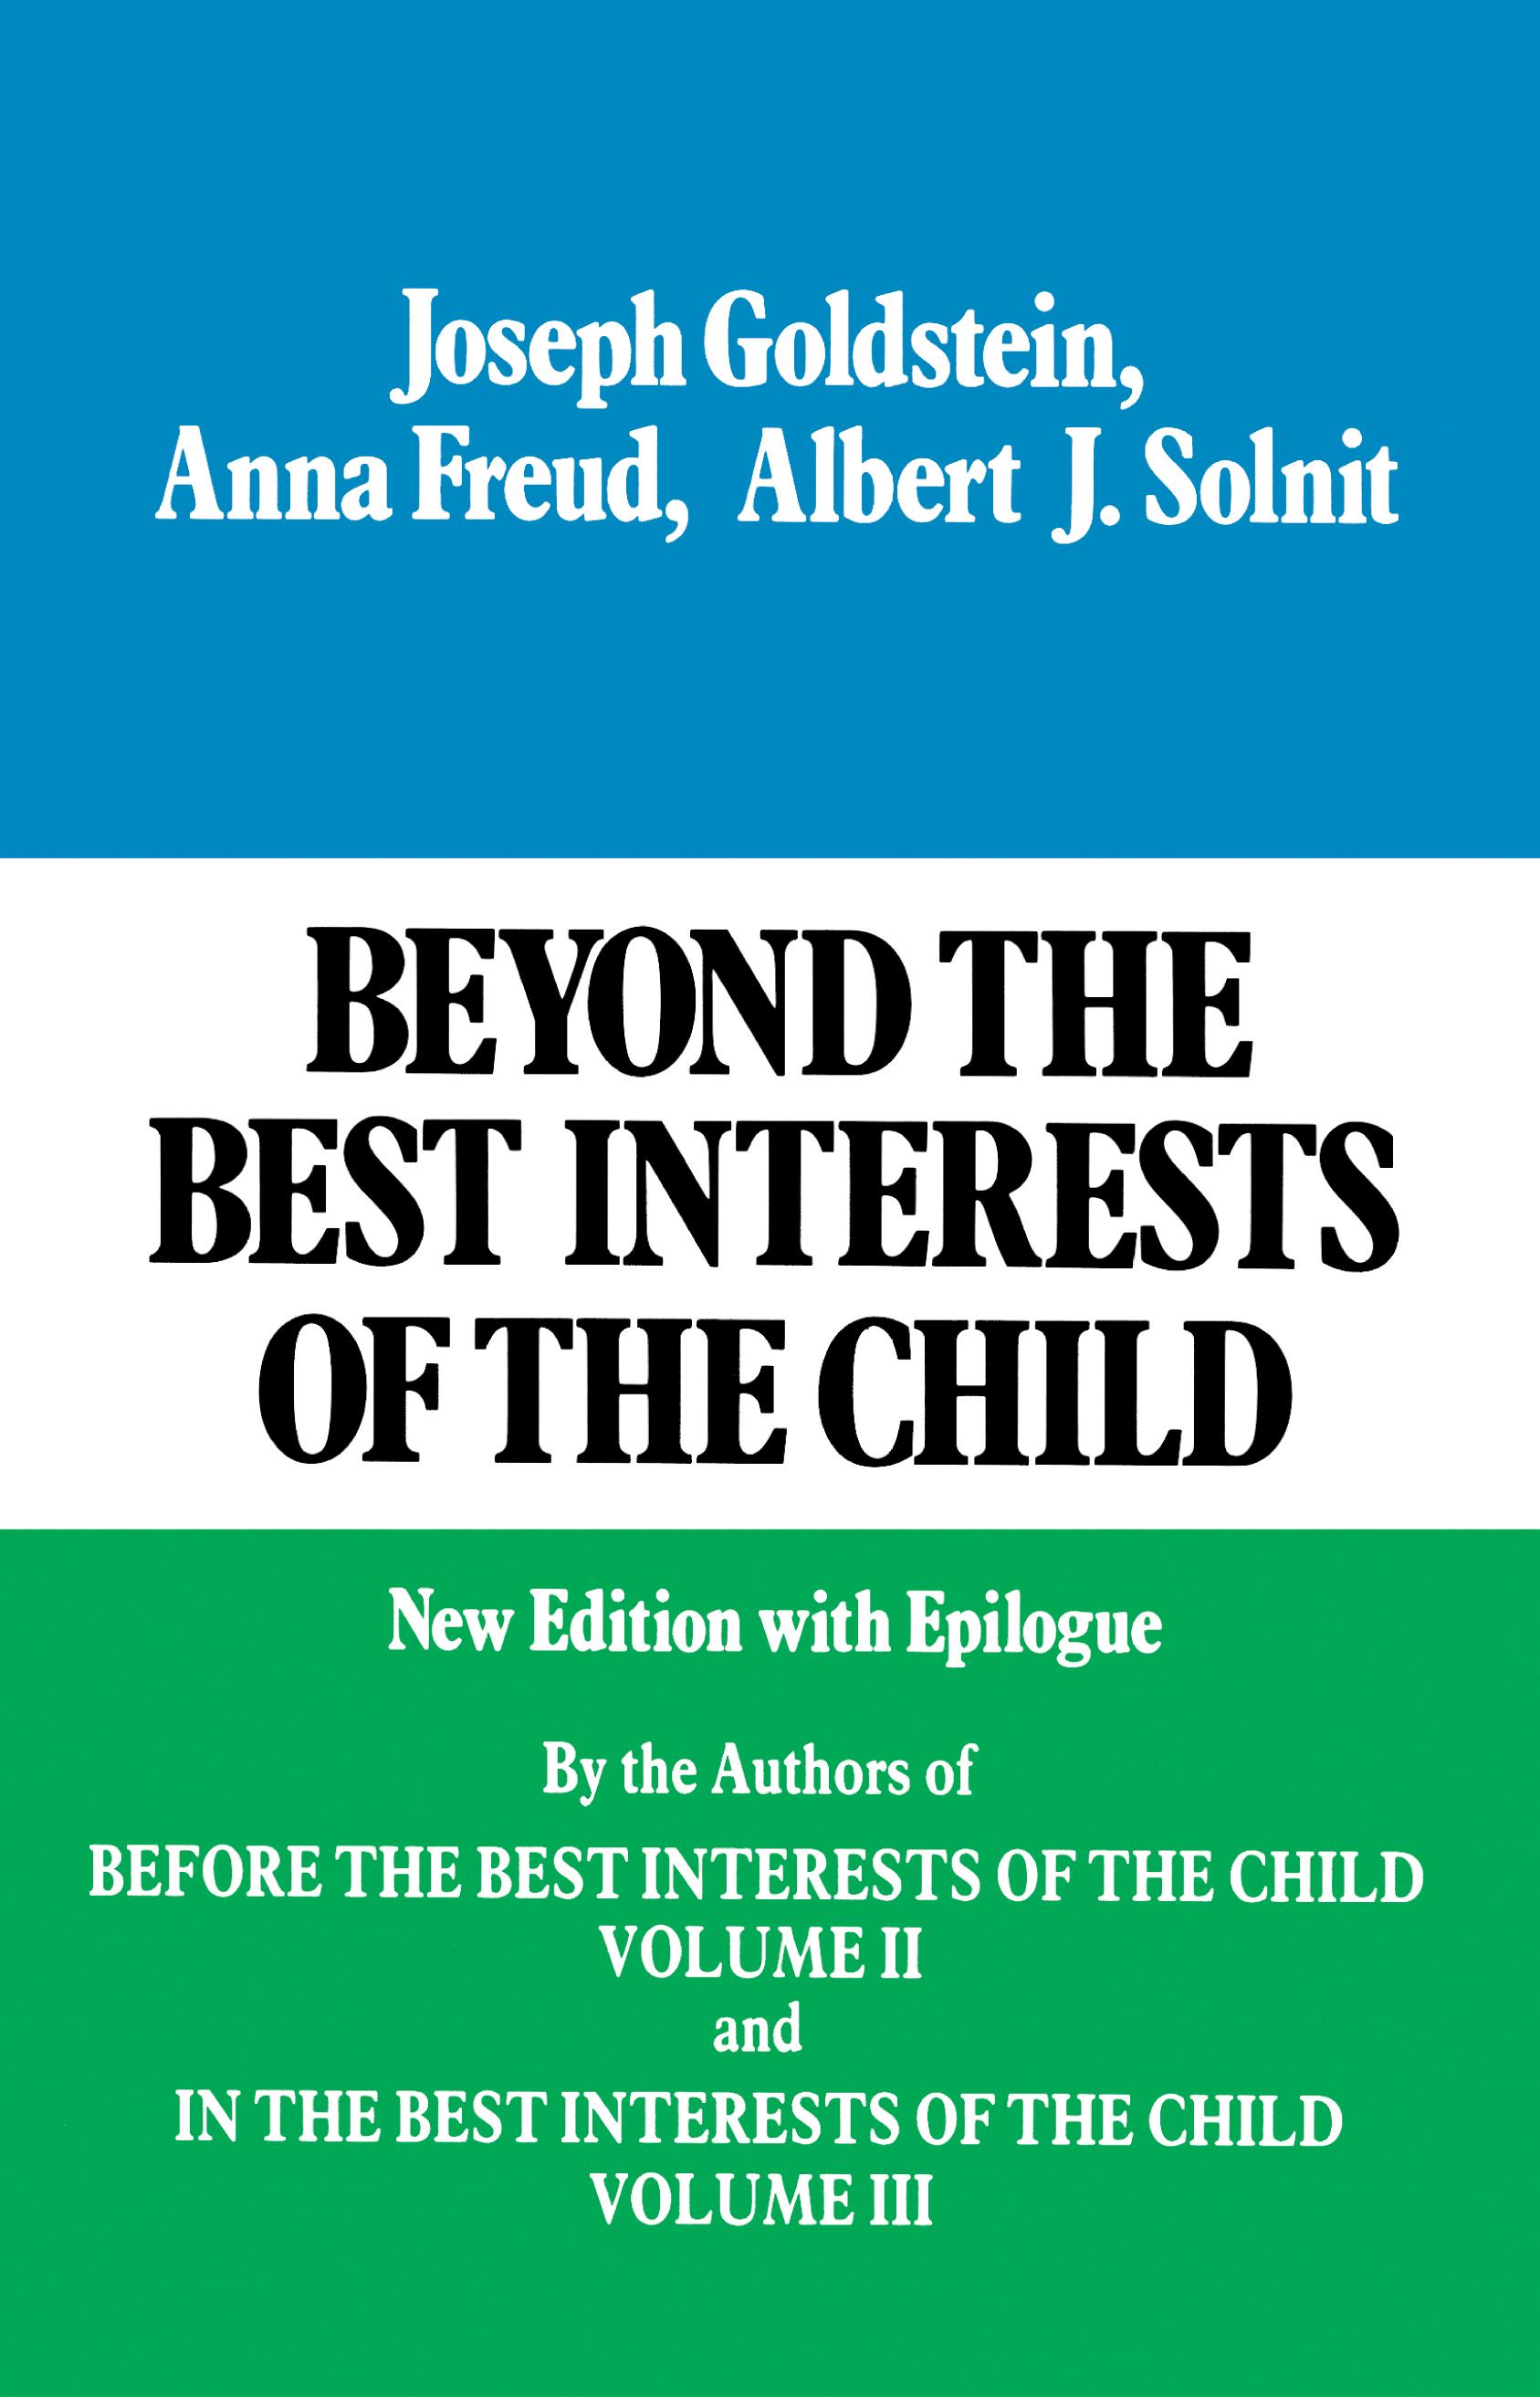 Beyond the best interests of the child book by joseph goldstein cvr9780029123607 9780029123607 hr beyond the best fandeluxe Gallery